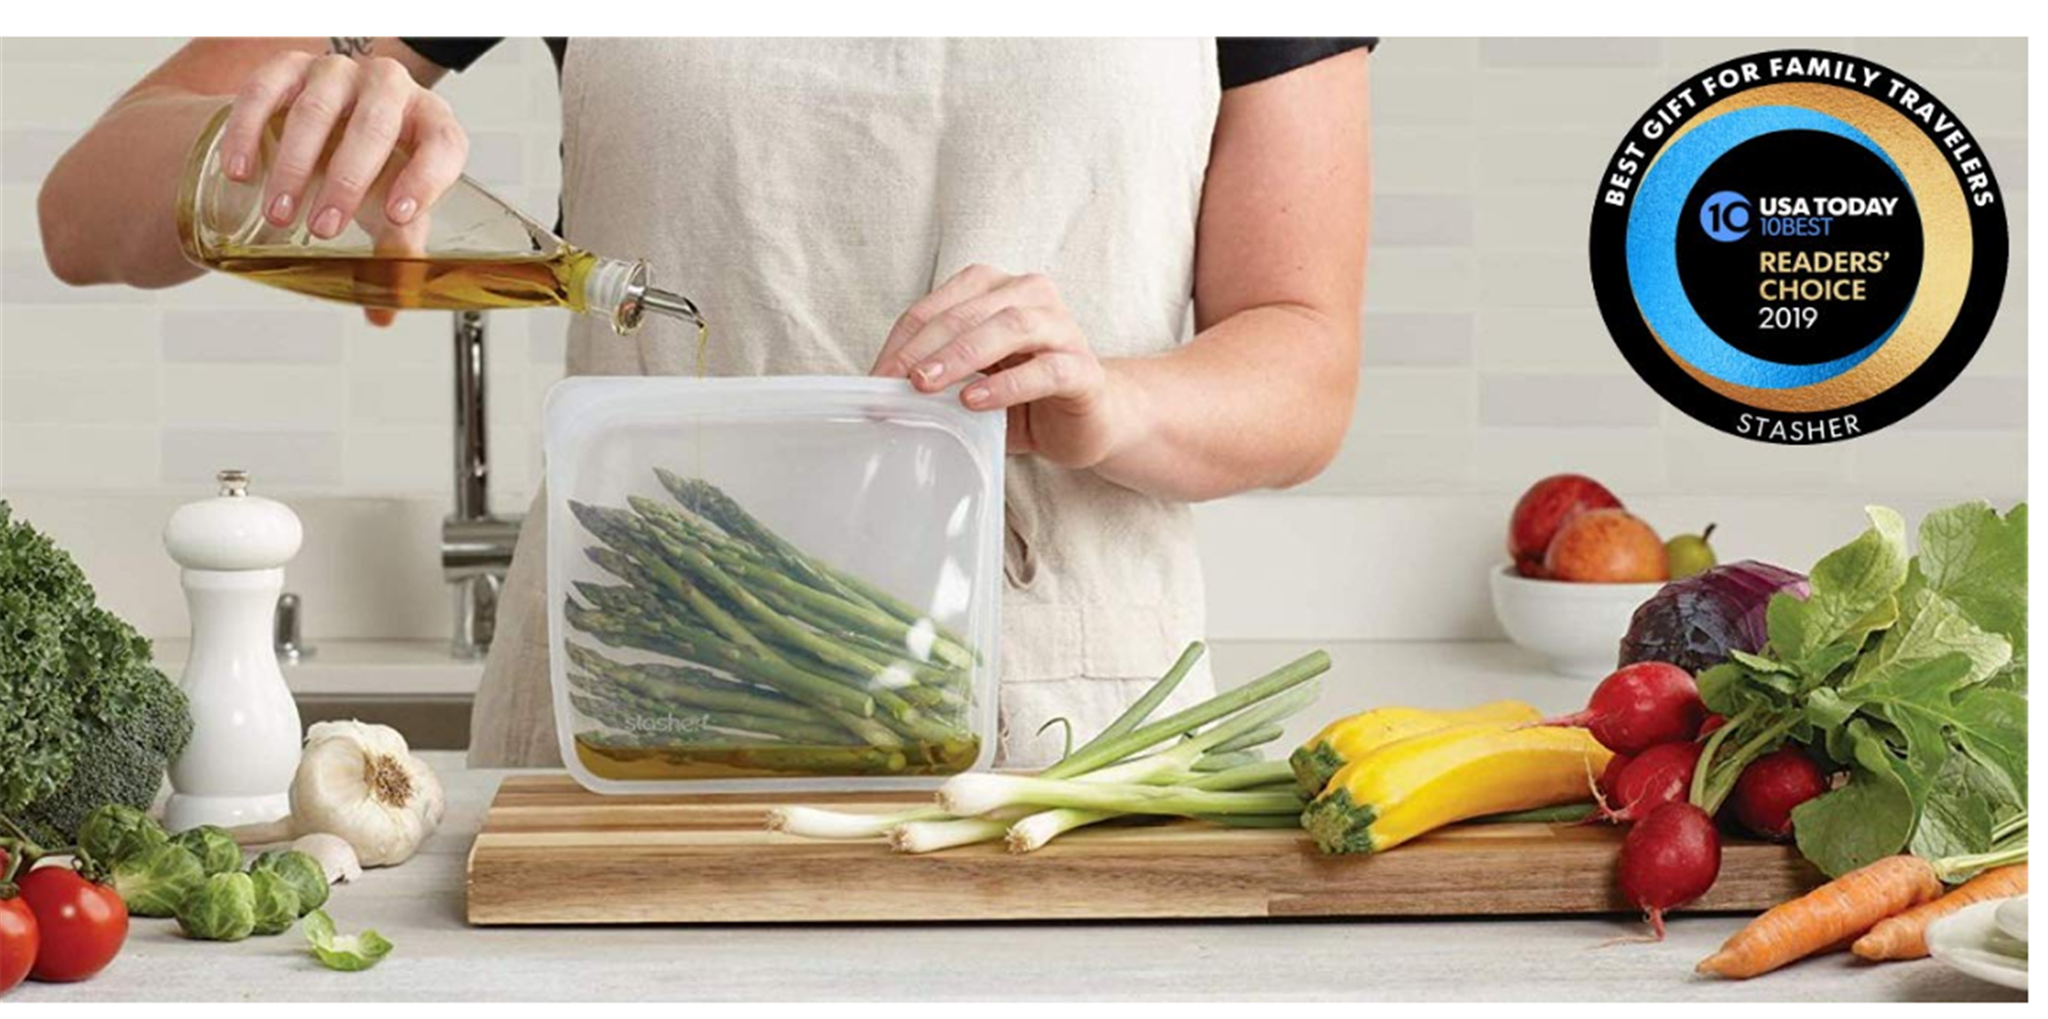 Amazon – 30% off Stasher Silicon Reusable Food Bags!